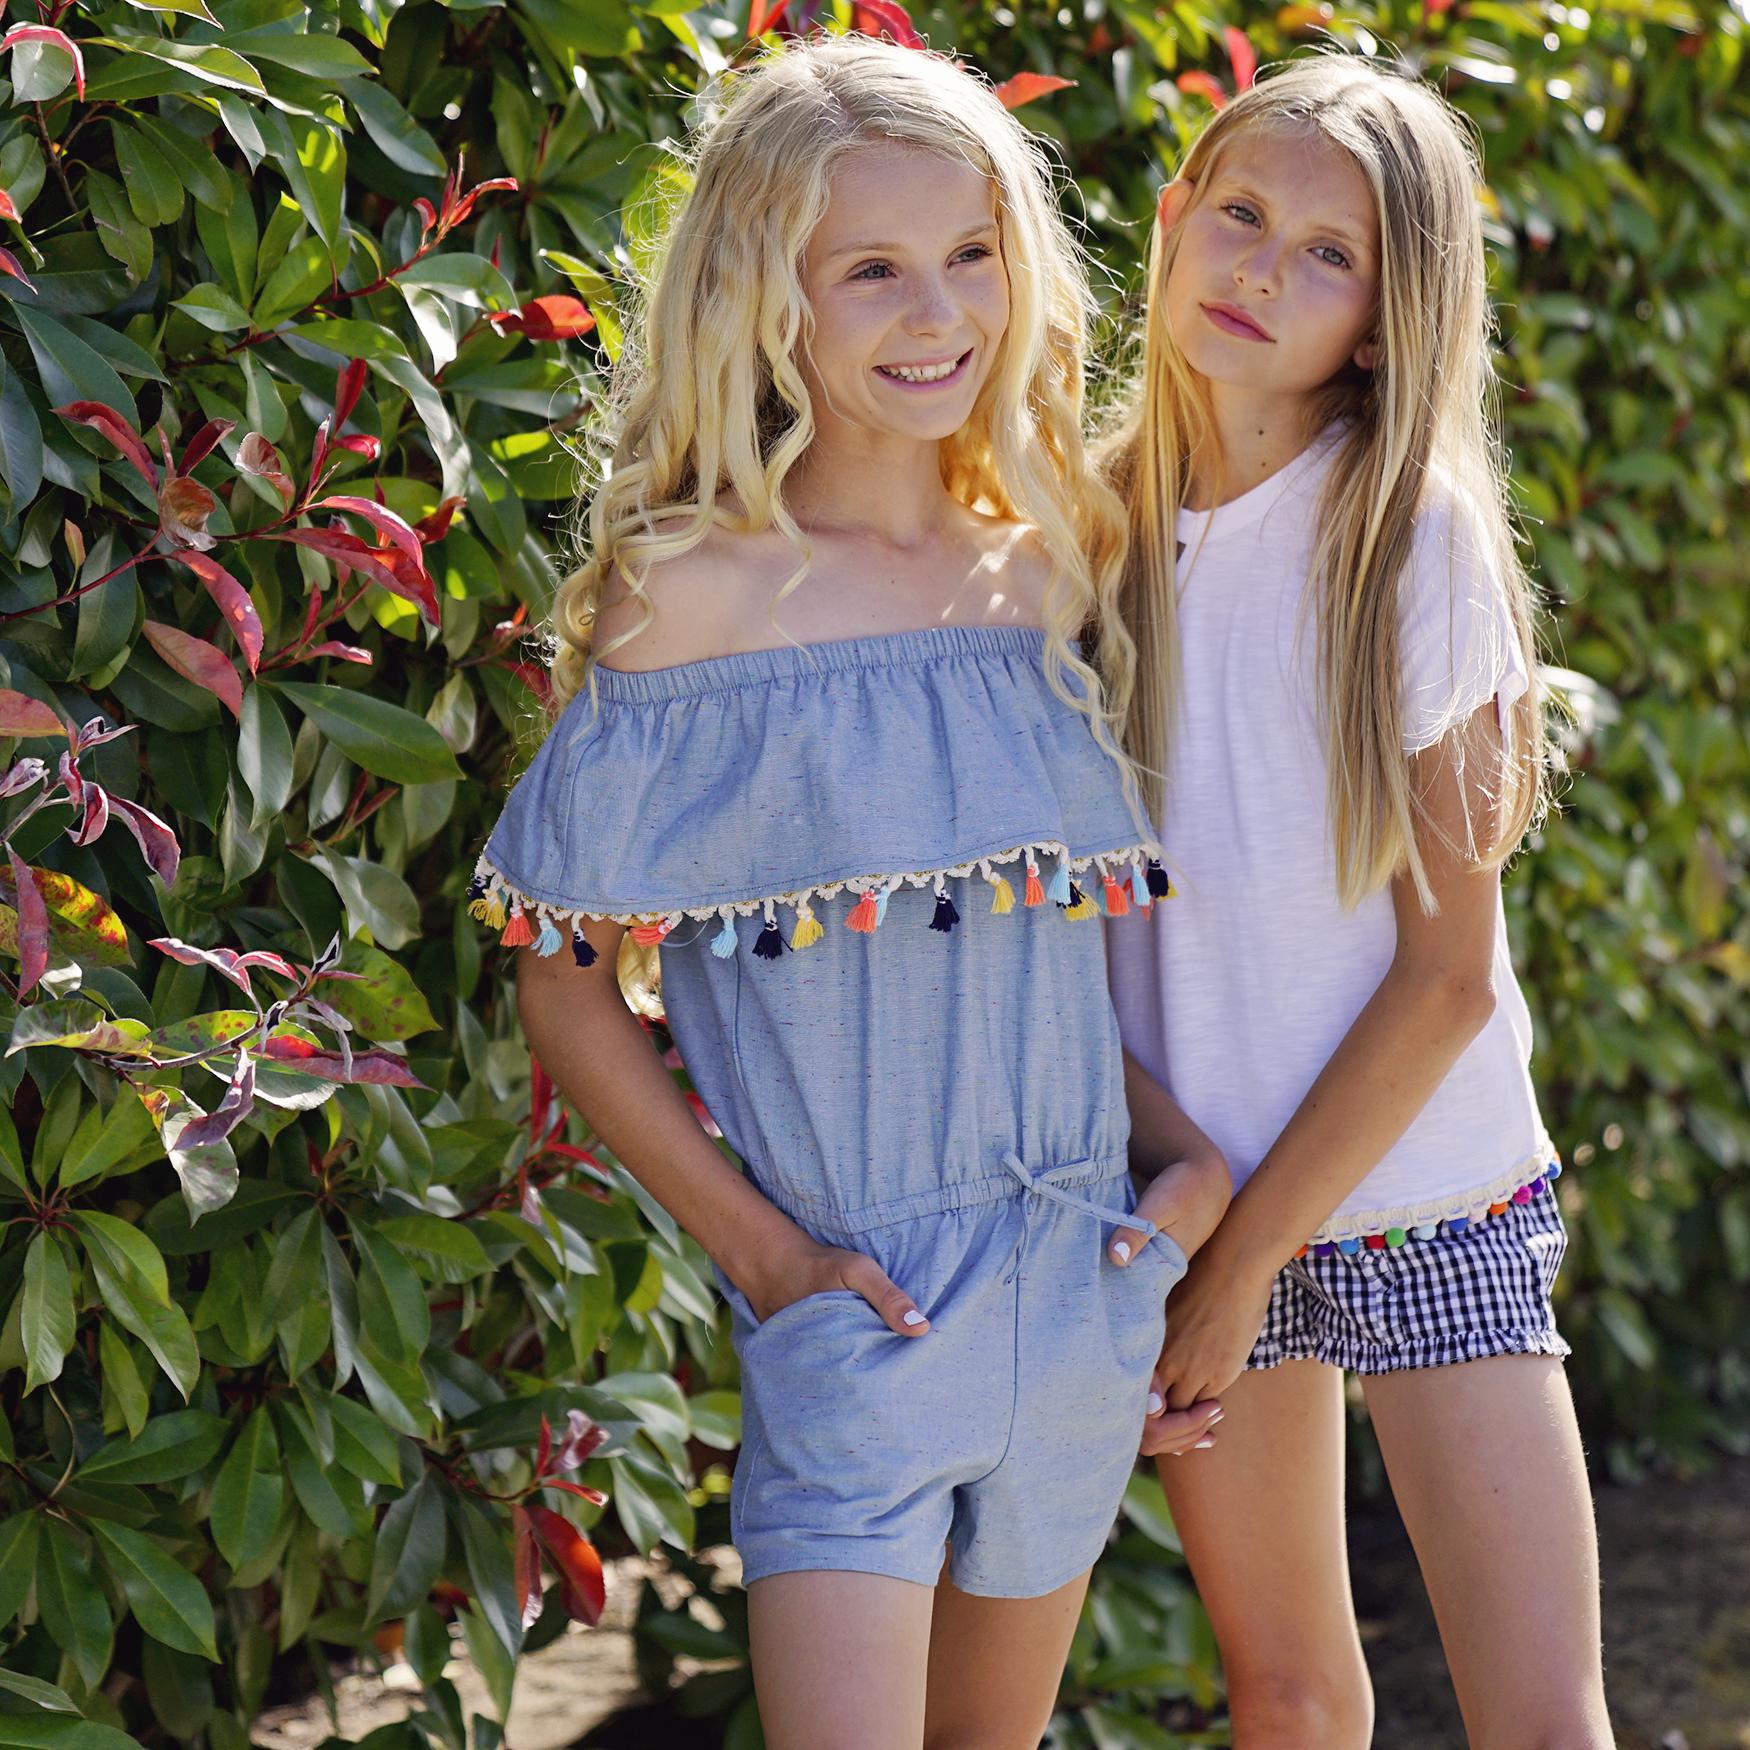 Fashion Mini Jurk met Ritssluiting Grijs - Fashion Of M